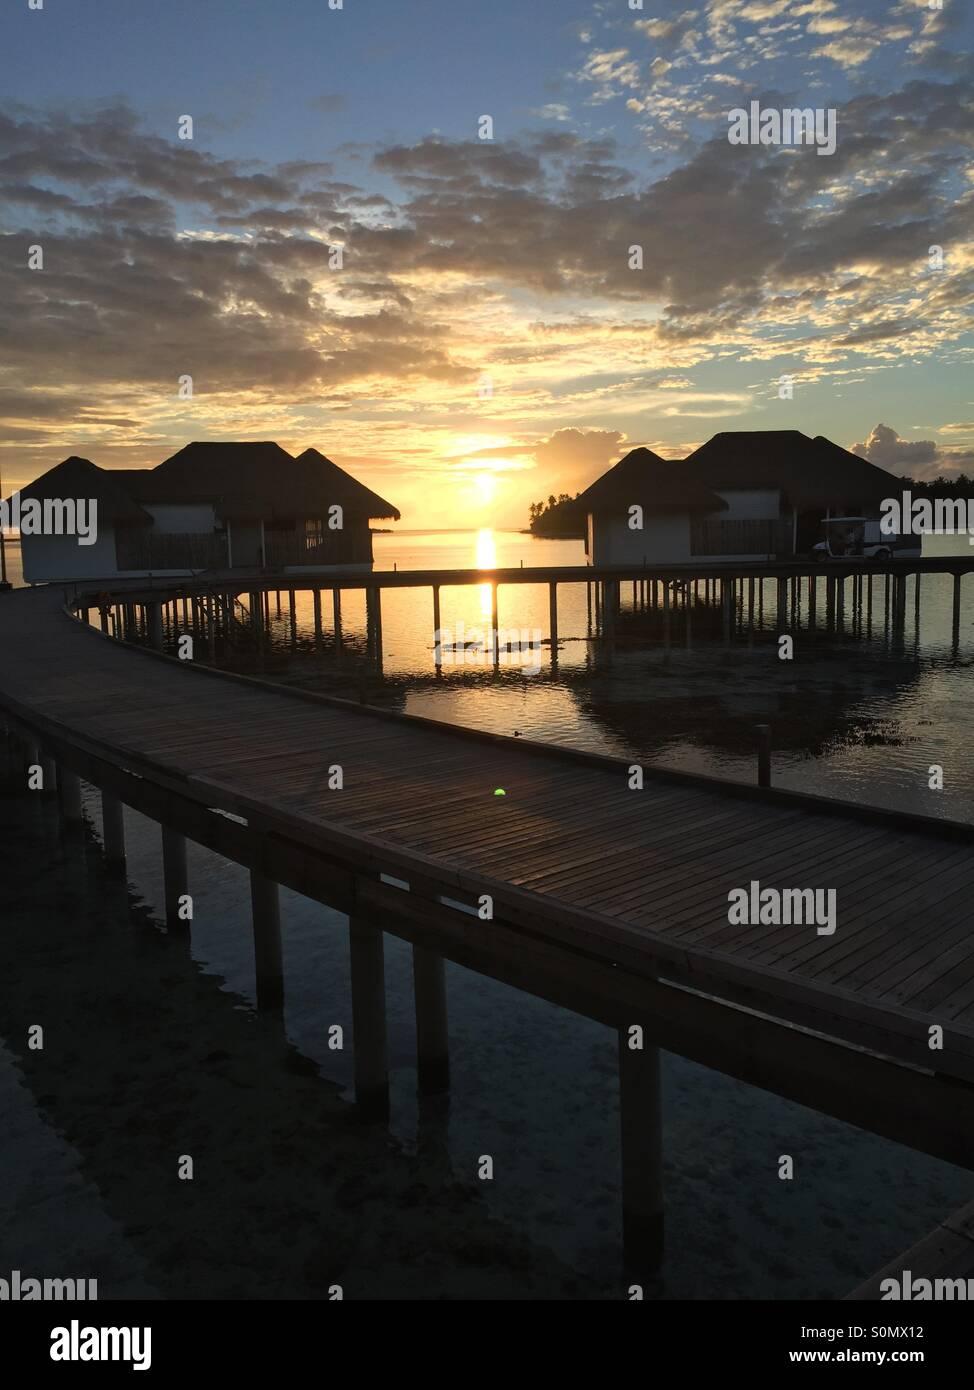 Sunset in Maldives - Stock Image